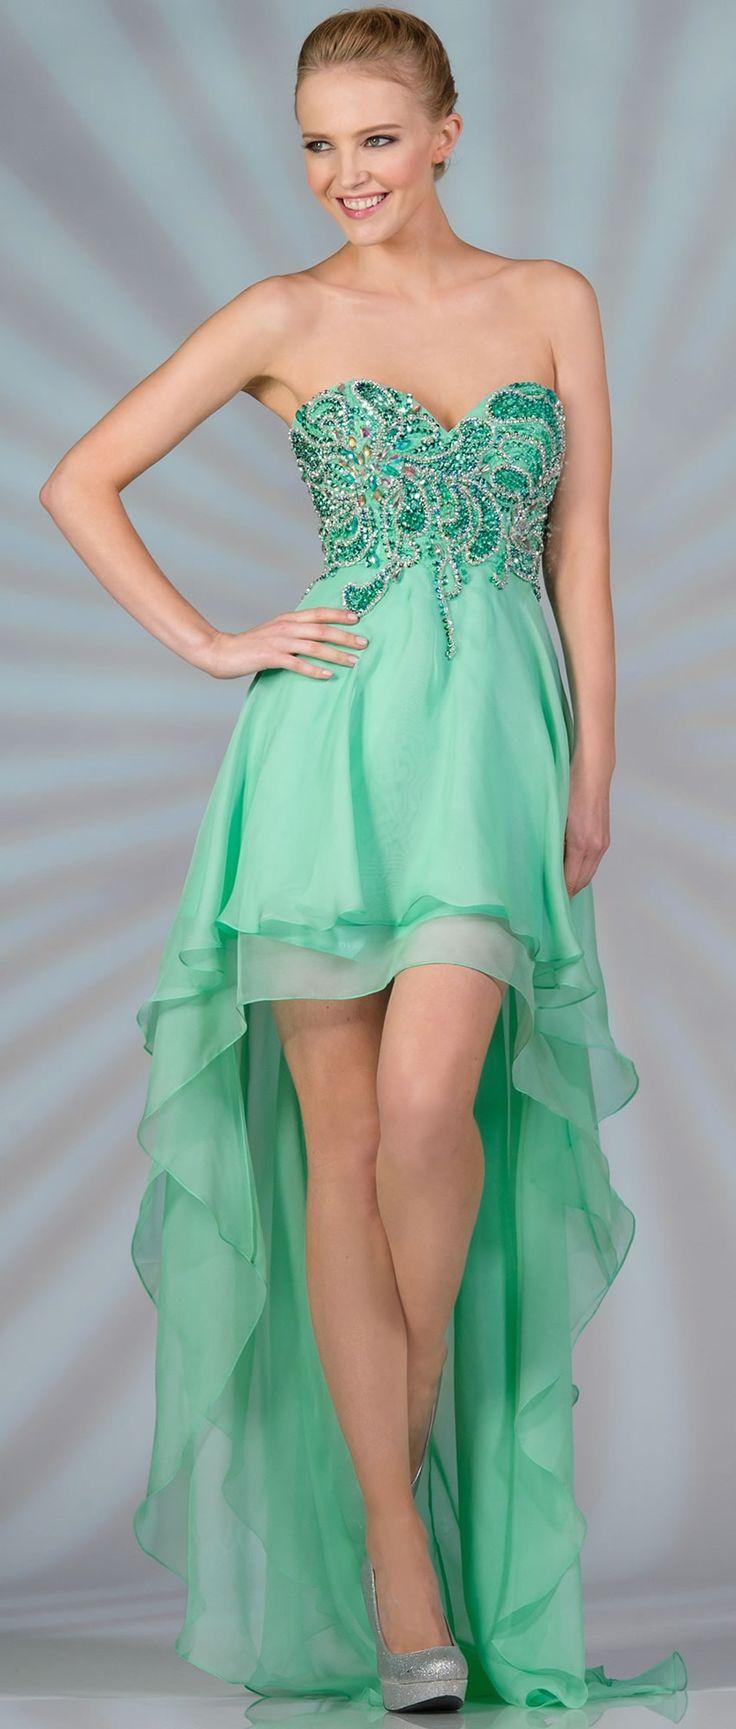 60 best High-Low Dresses images on Pinterest | Ball gowns, Ballroom ...